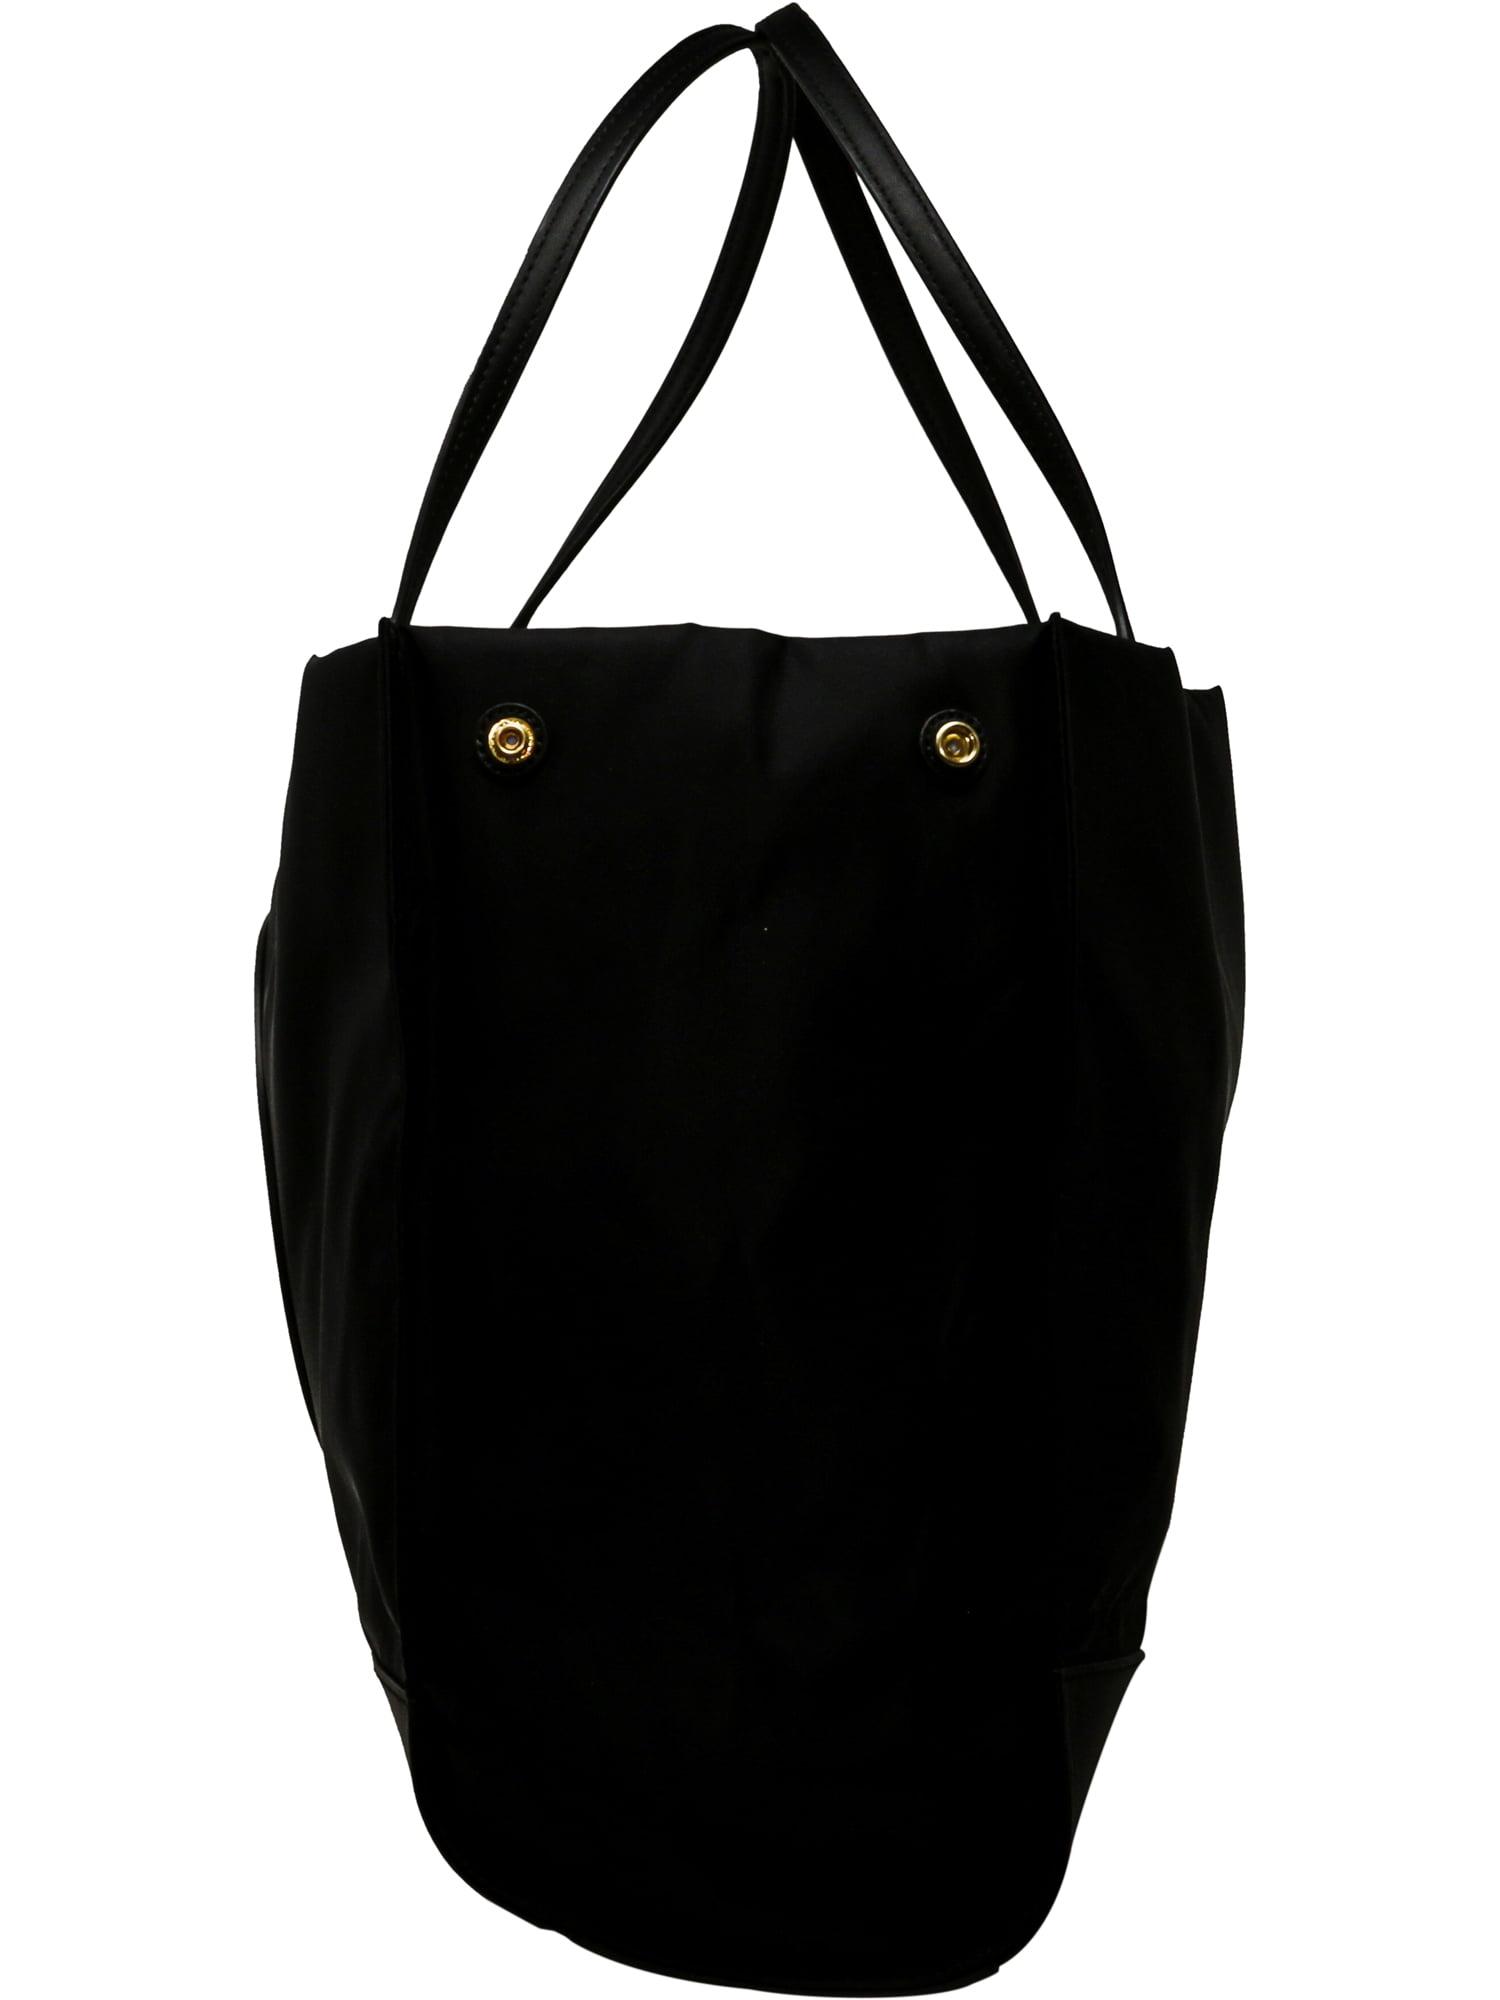 0bc7e76a762c Tory Burch - Tory Burch Women s Ella Nylon Top-Handle Bag Tote - Navy -  Walmart.com